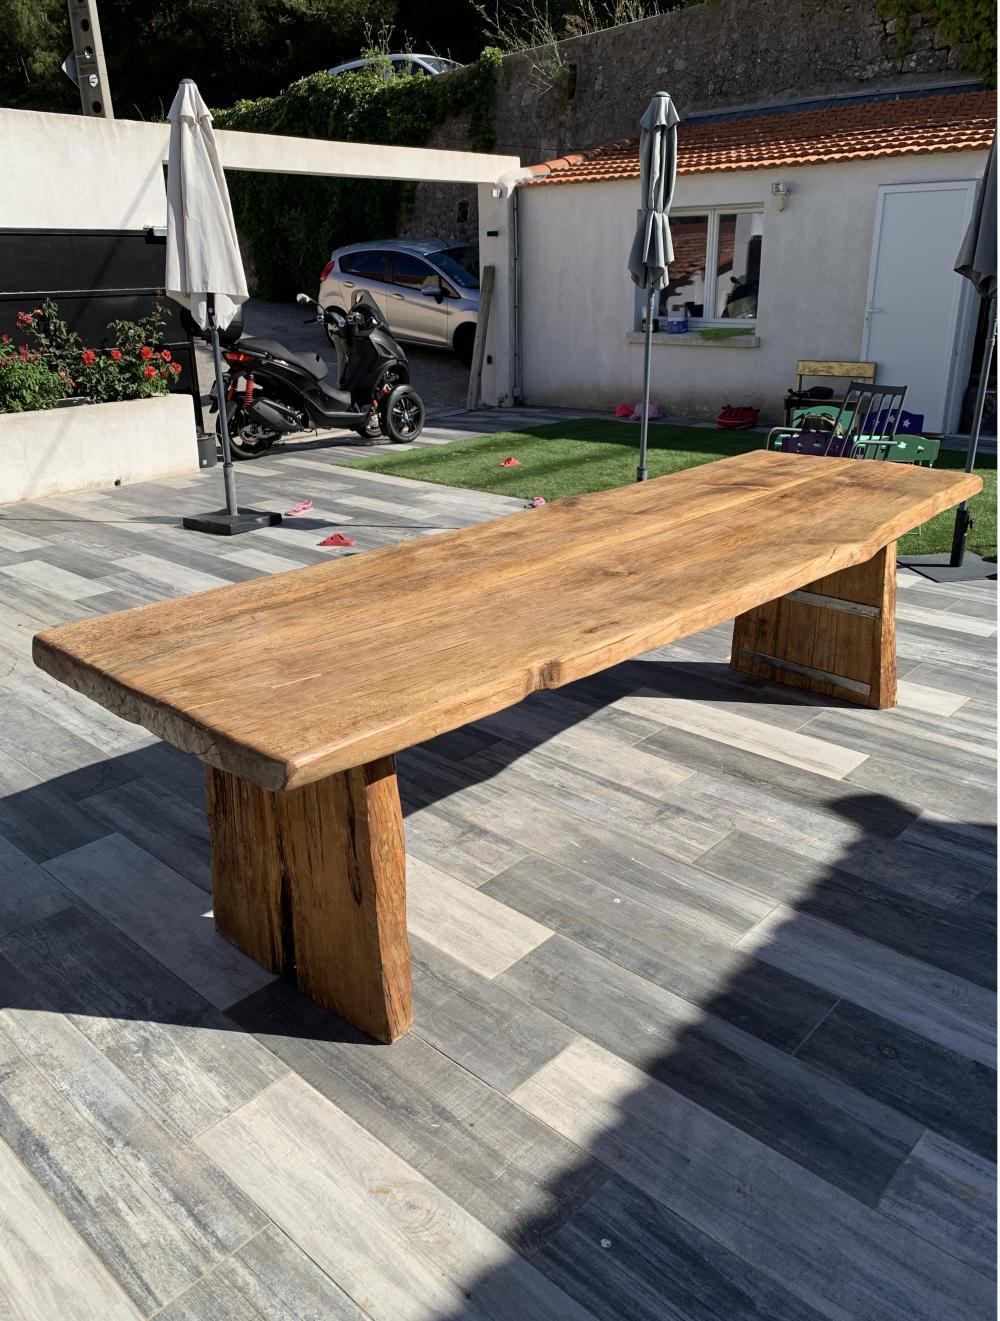 Table en bois bords irréguliers